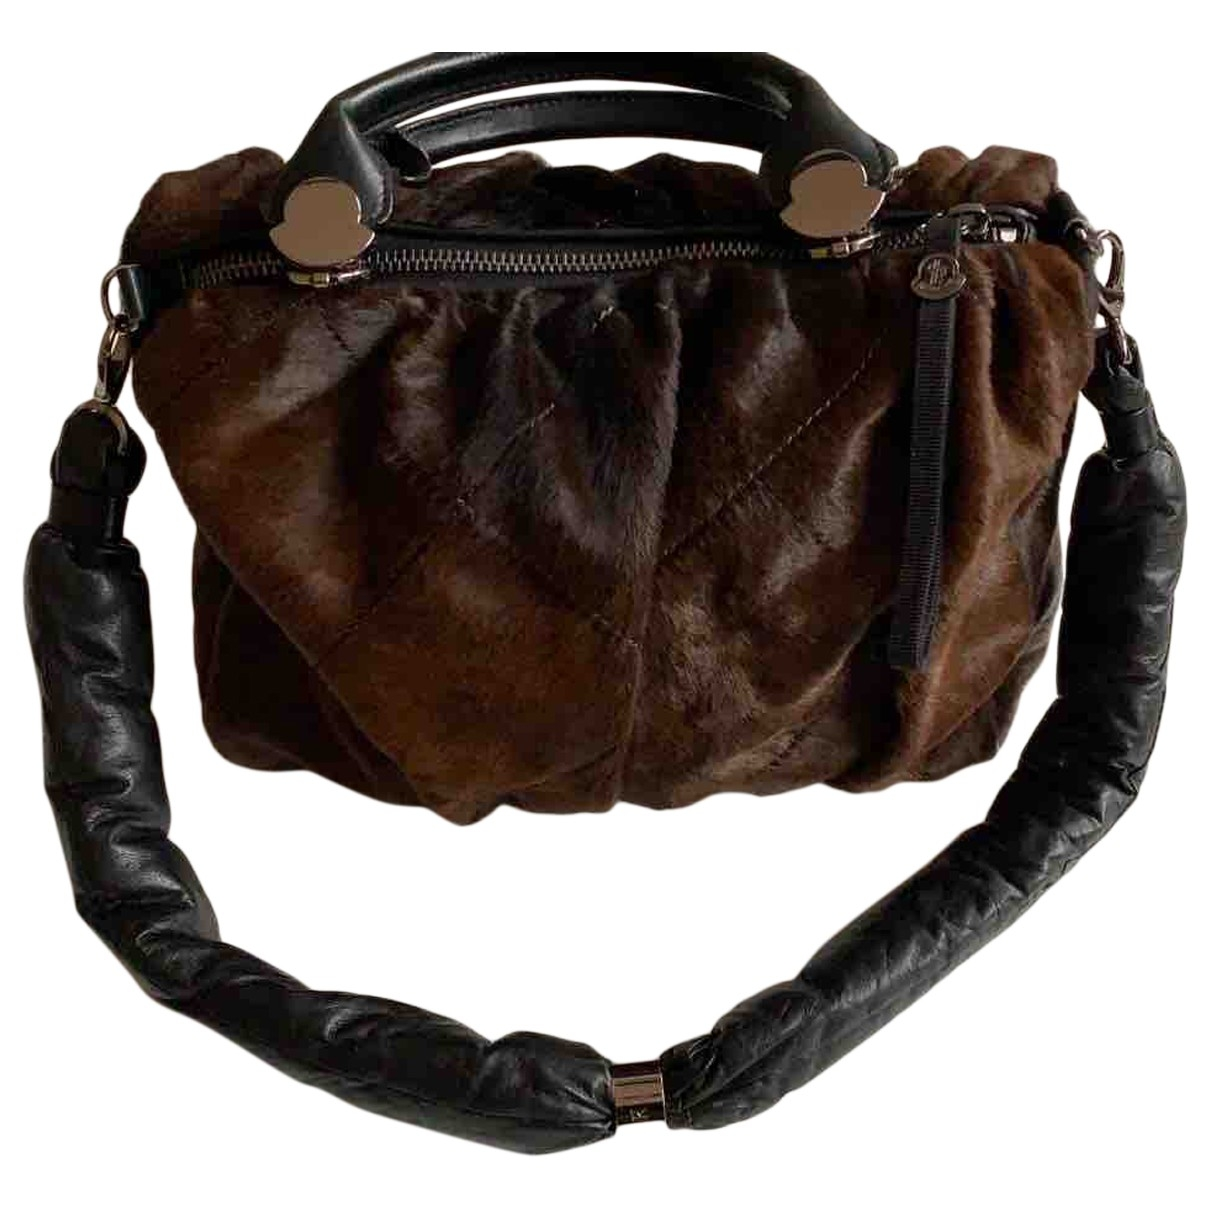 Moncler \N Brown Leather handbag for Women \N